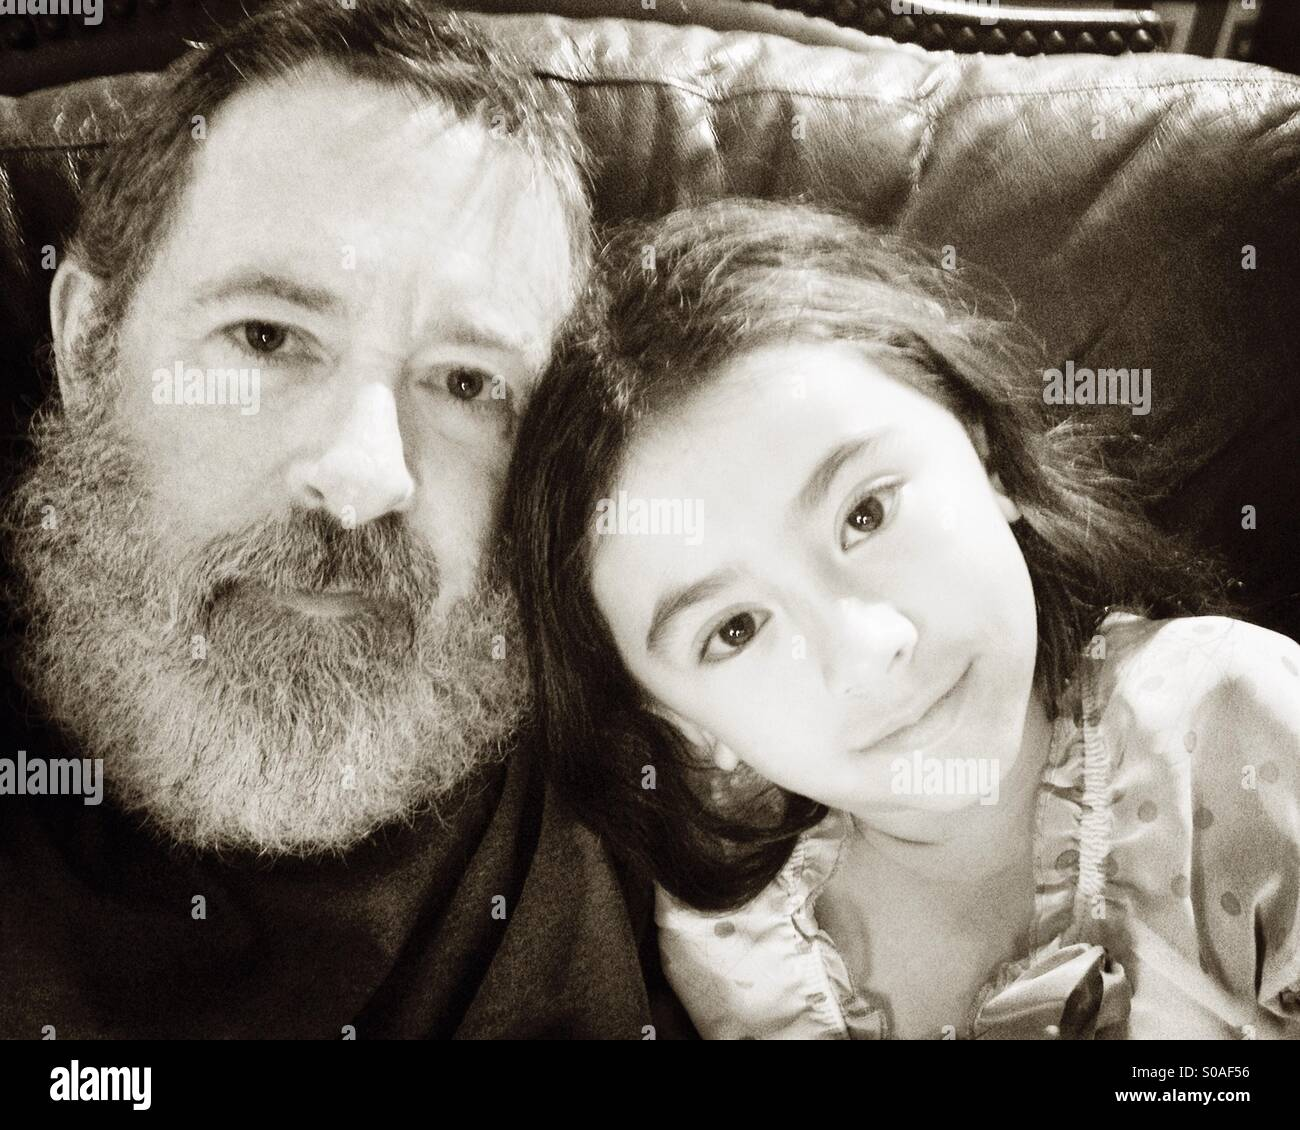 Padre e hija selfie. Imagen De Stock